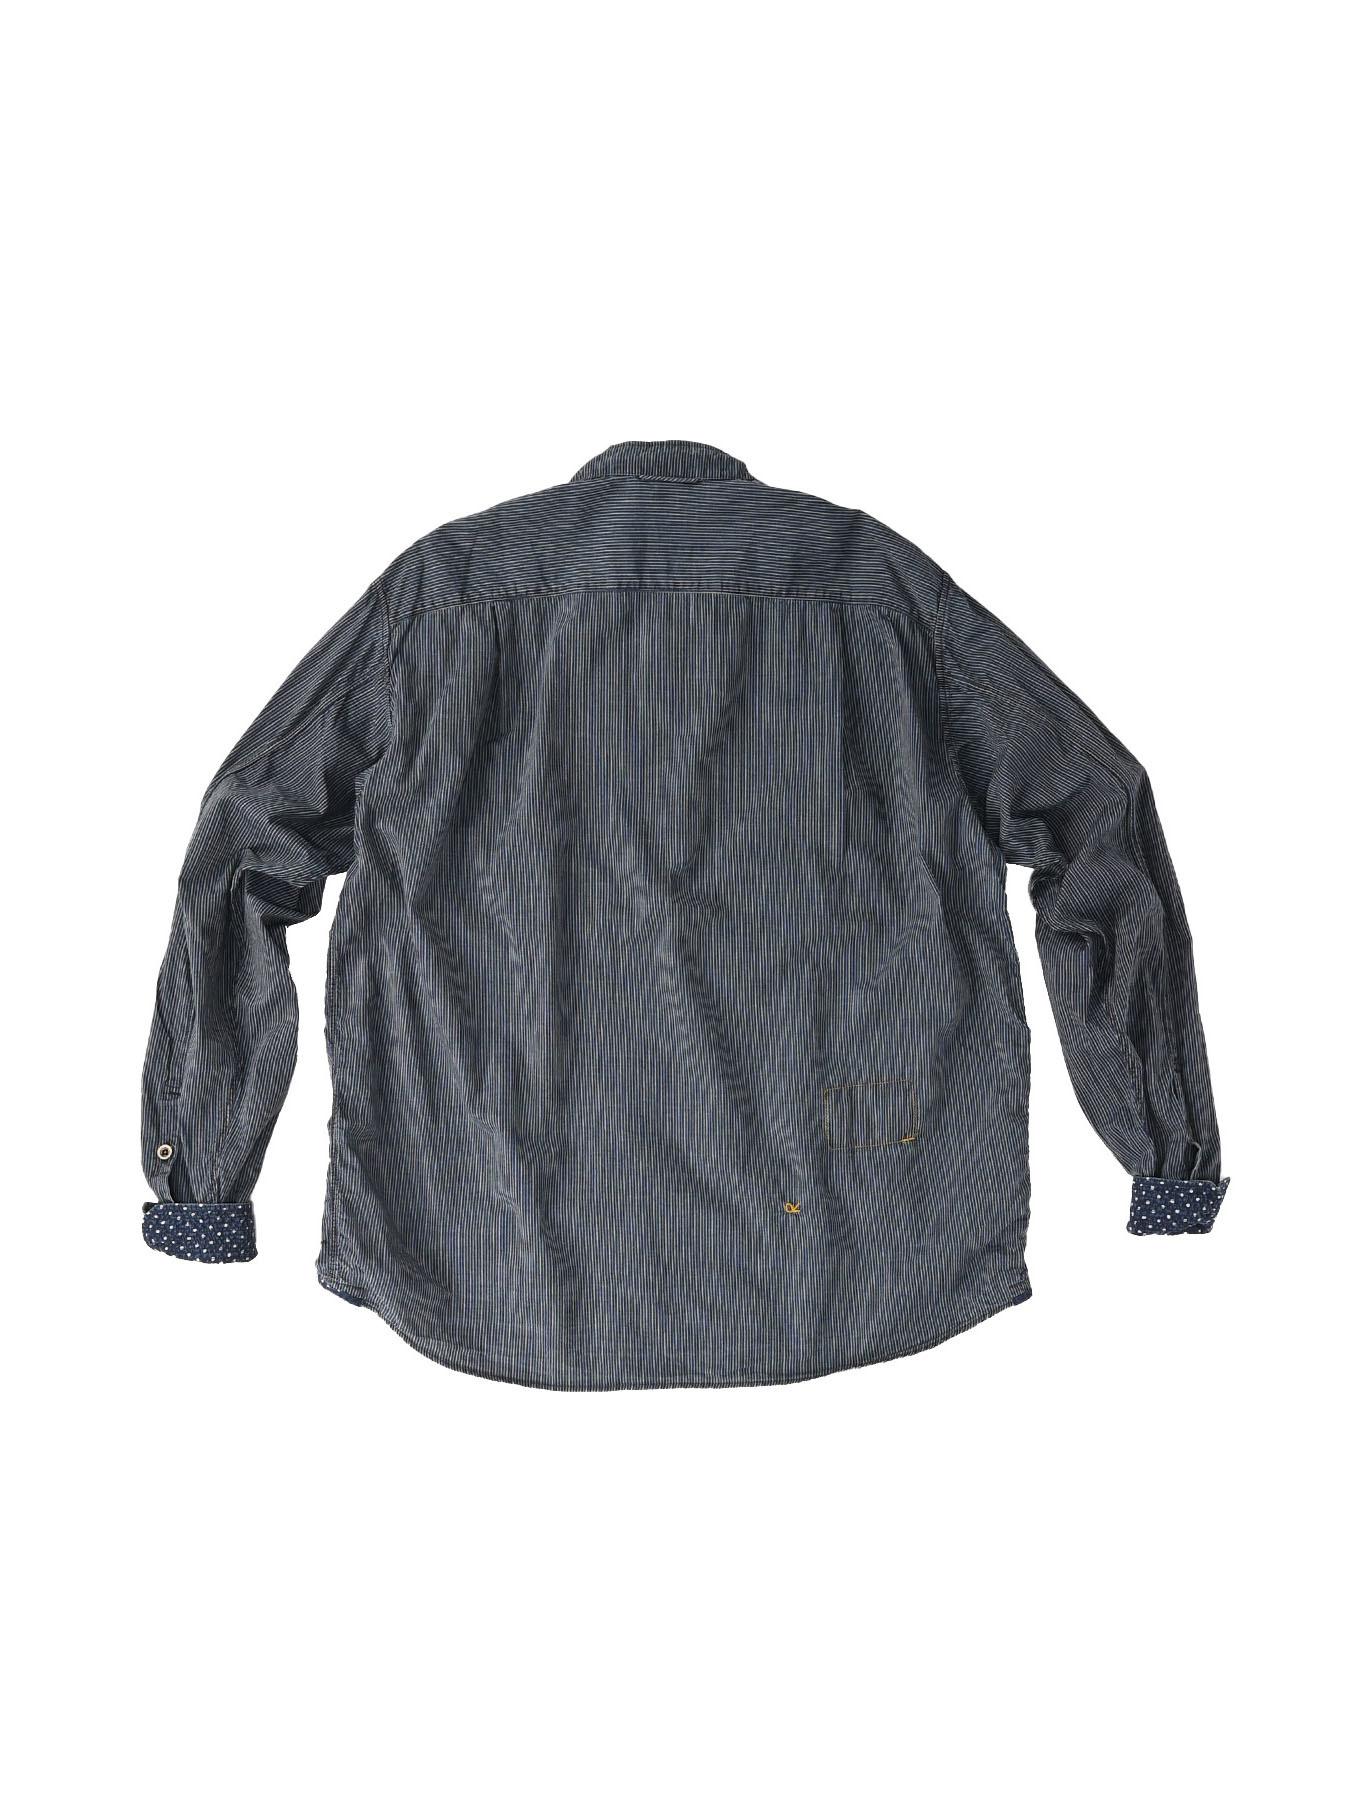 Indigo Hickory Tappet Ocean Stand Shirt-10